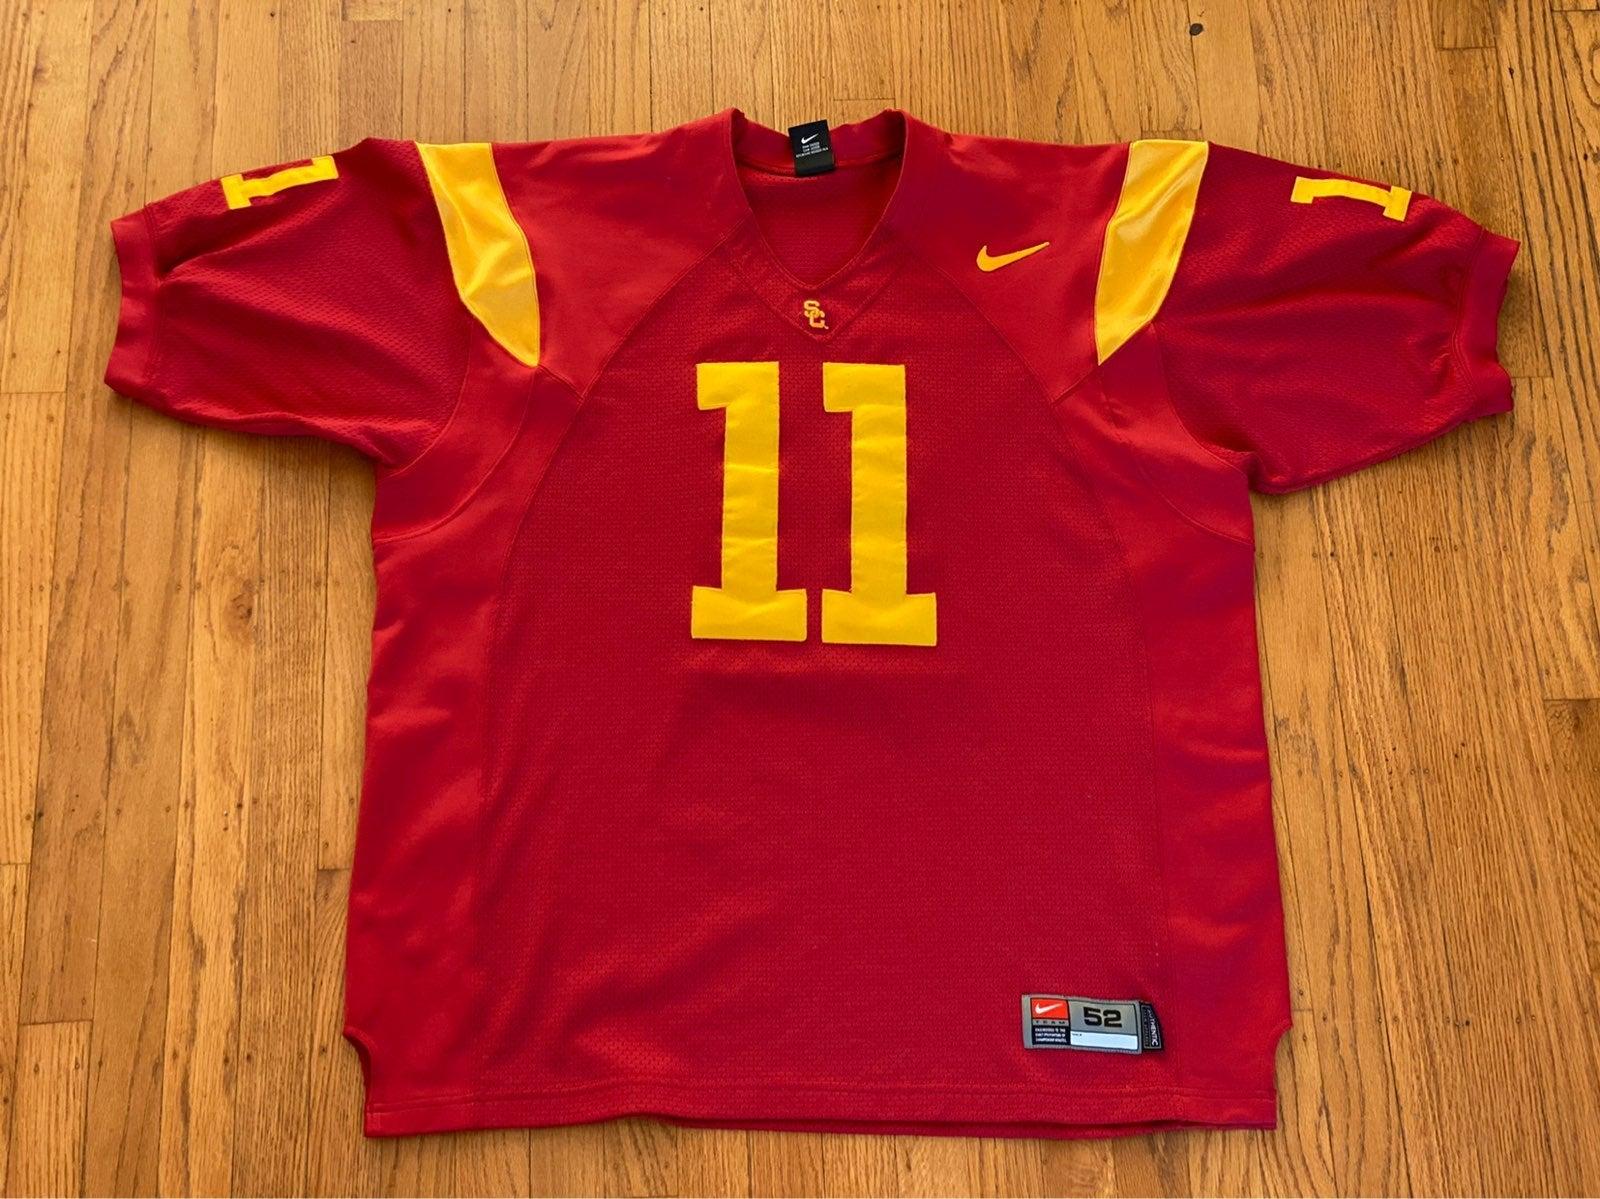 Authentic Nike USC Matt Leinart Jersey